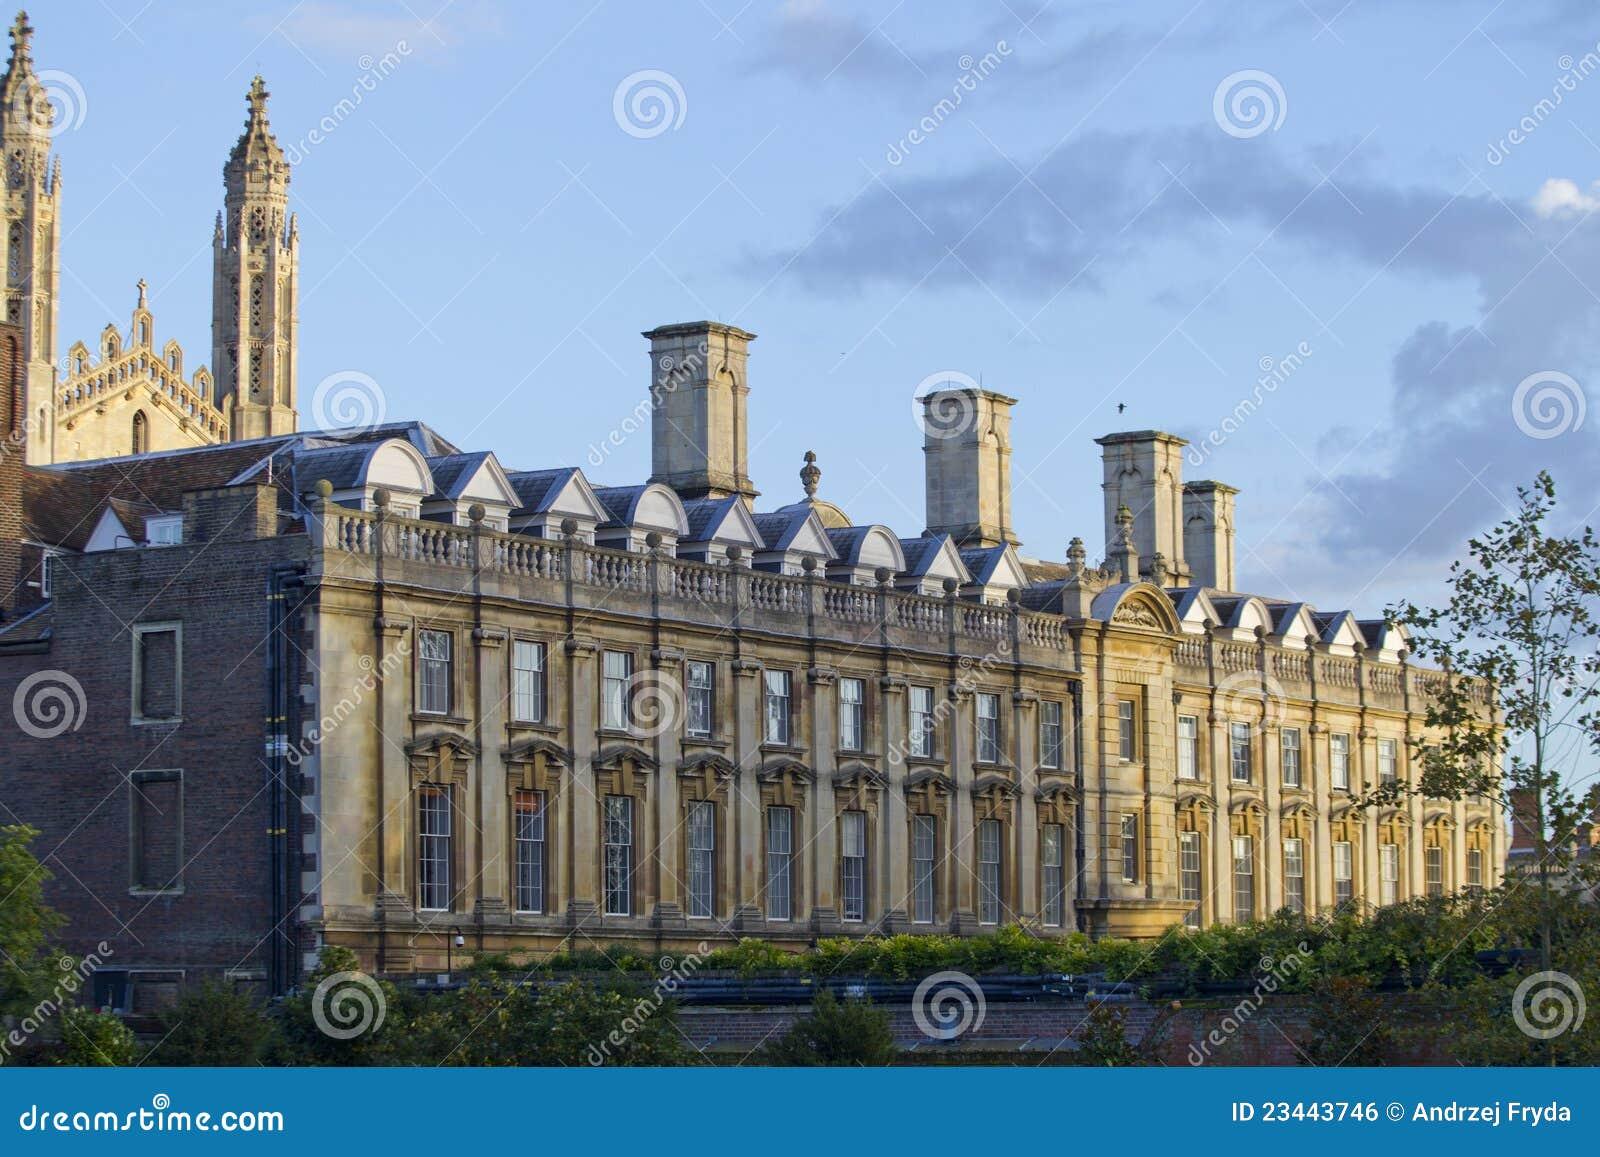 To The University Of Cambridge - Poem by Phillis Wheatley